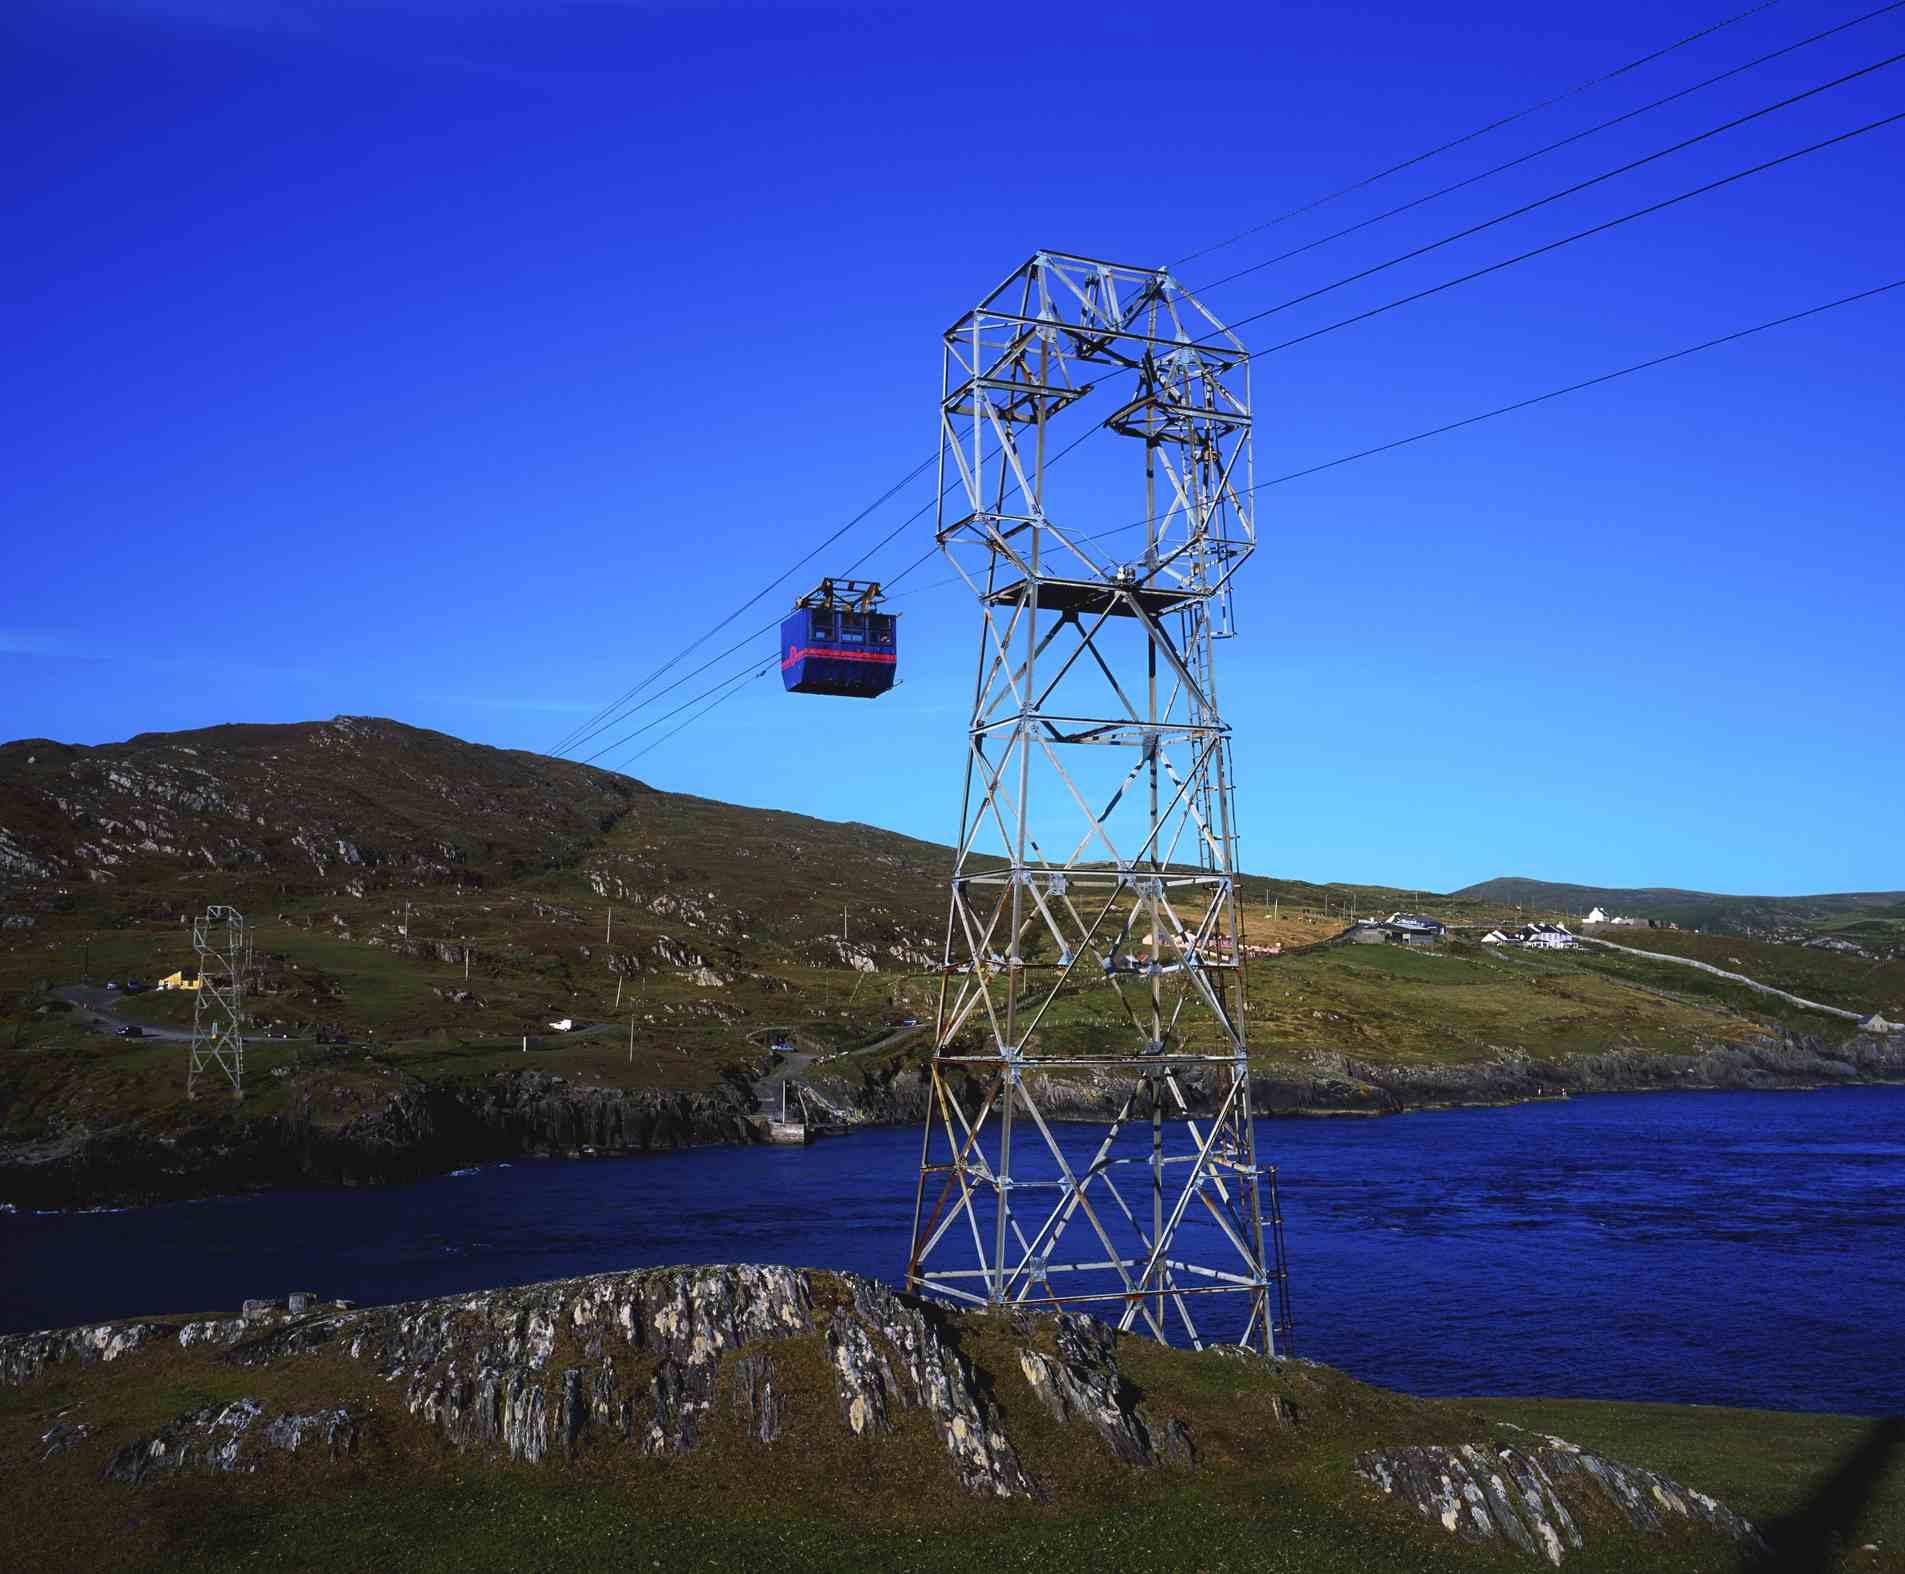 Dursey Island, County Cork, Ireland, Cable Car